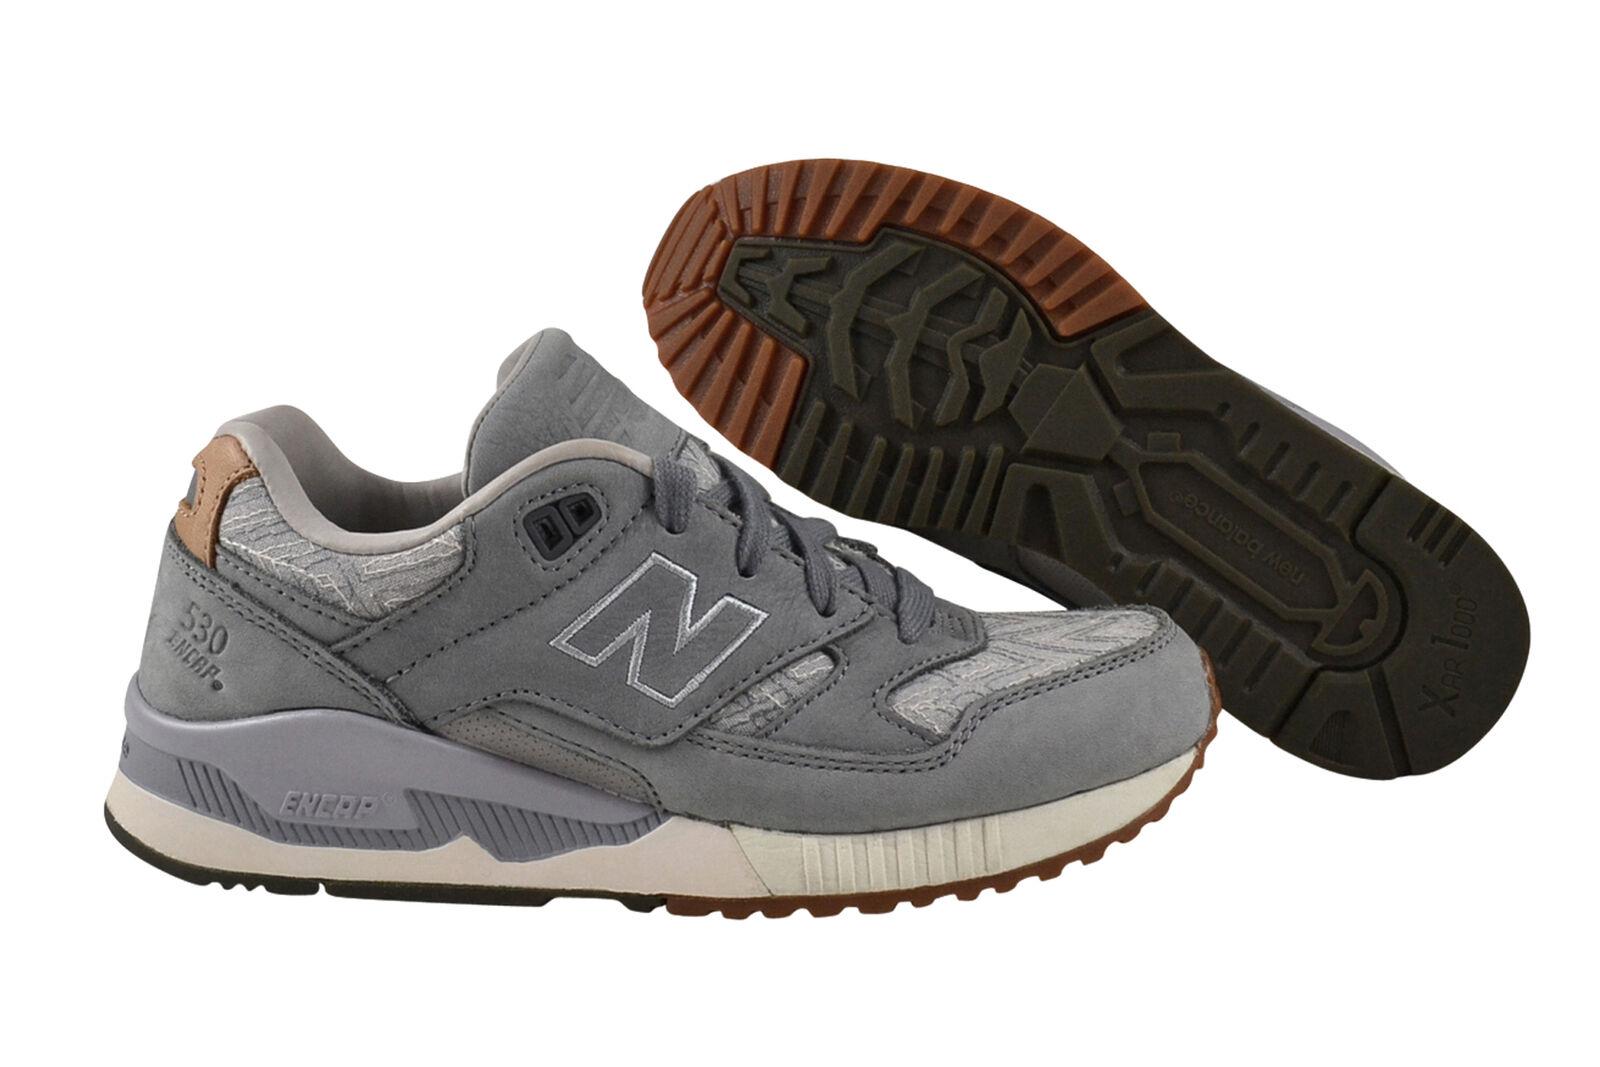 New Balance W530 GAR grau Schuhe Turnschuhe grau